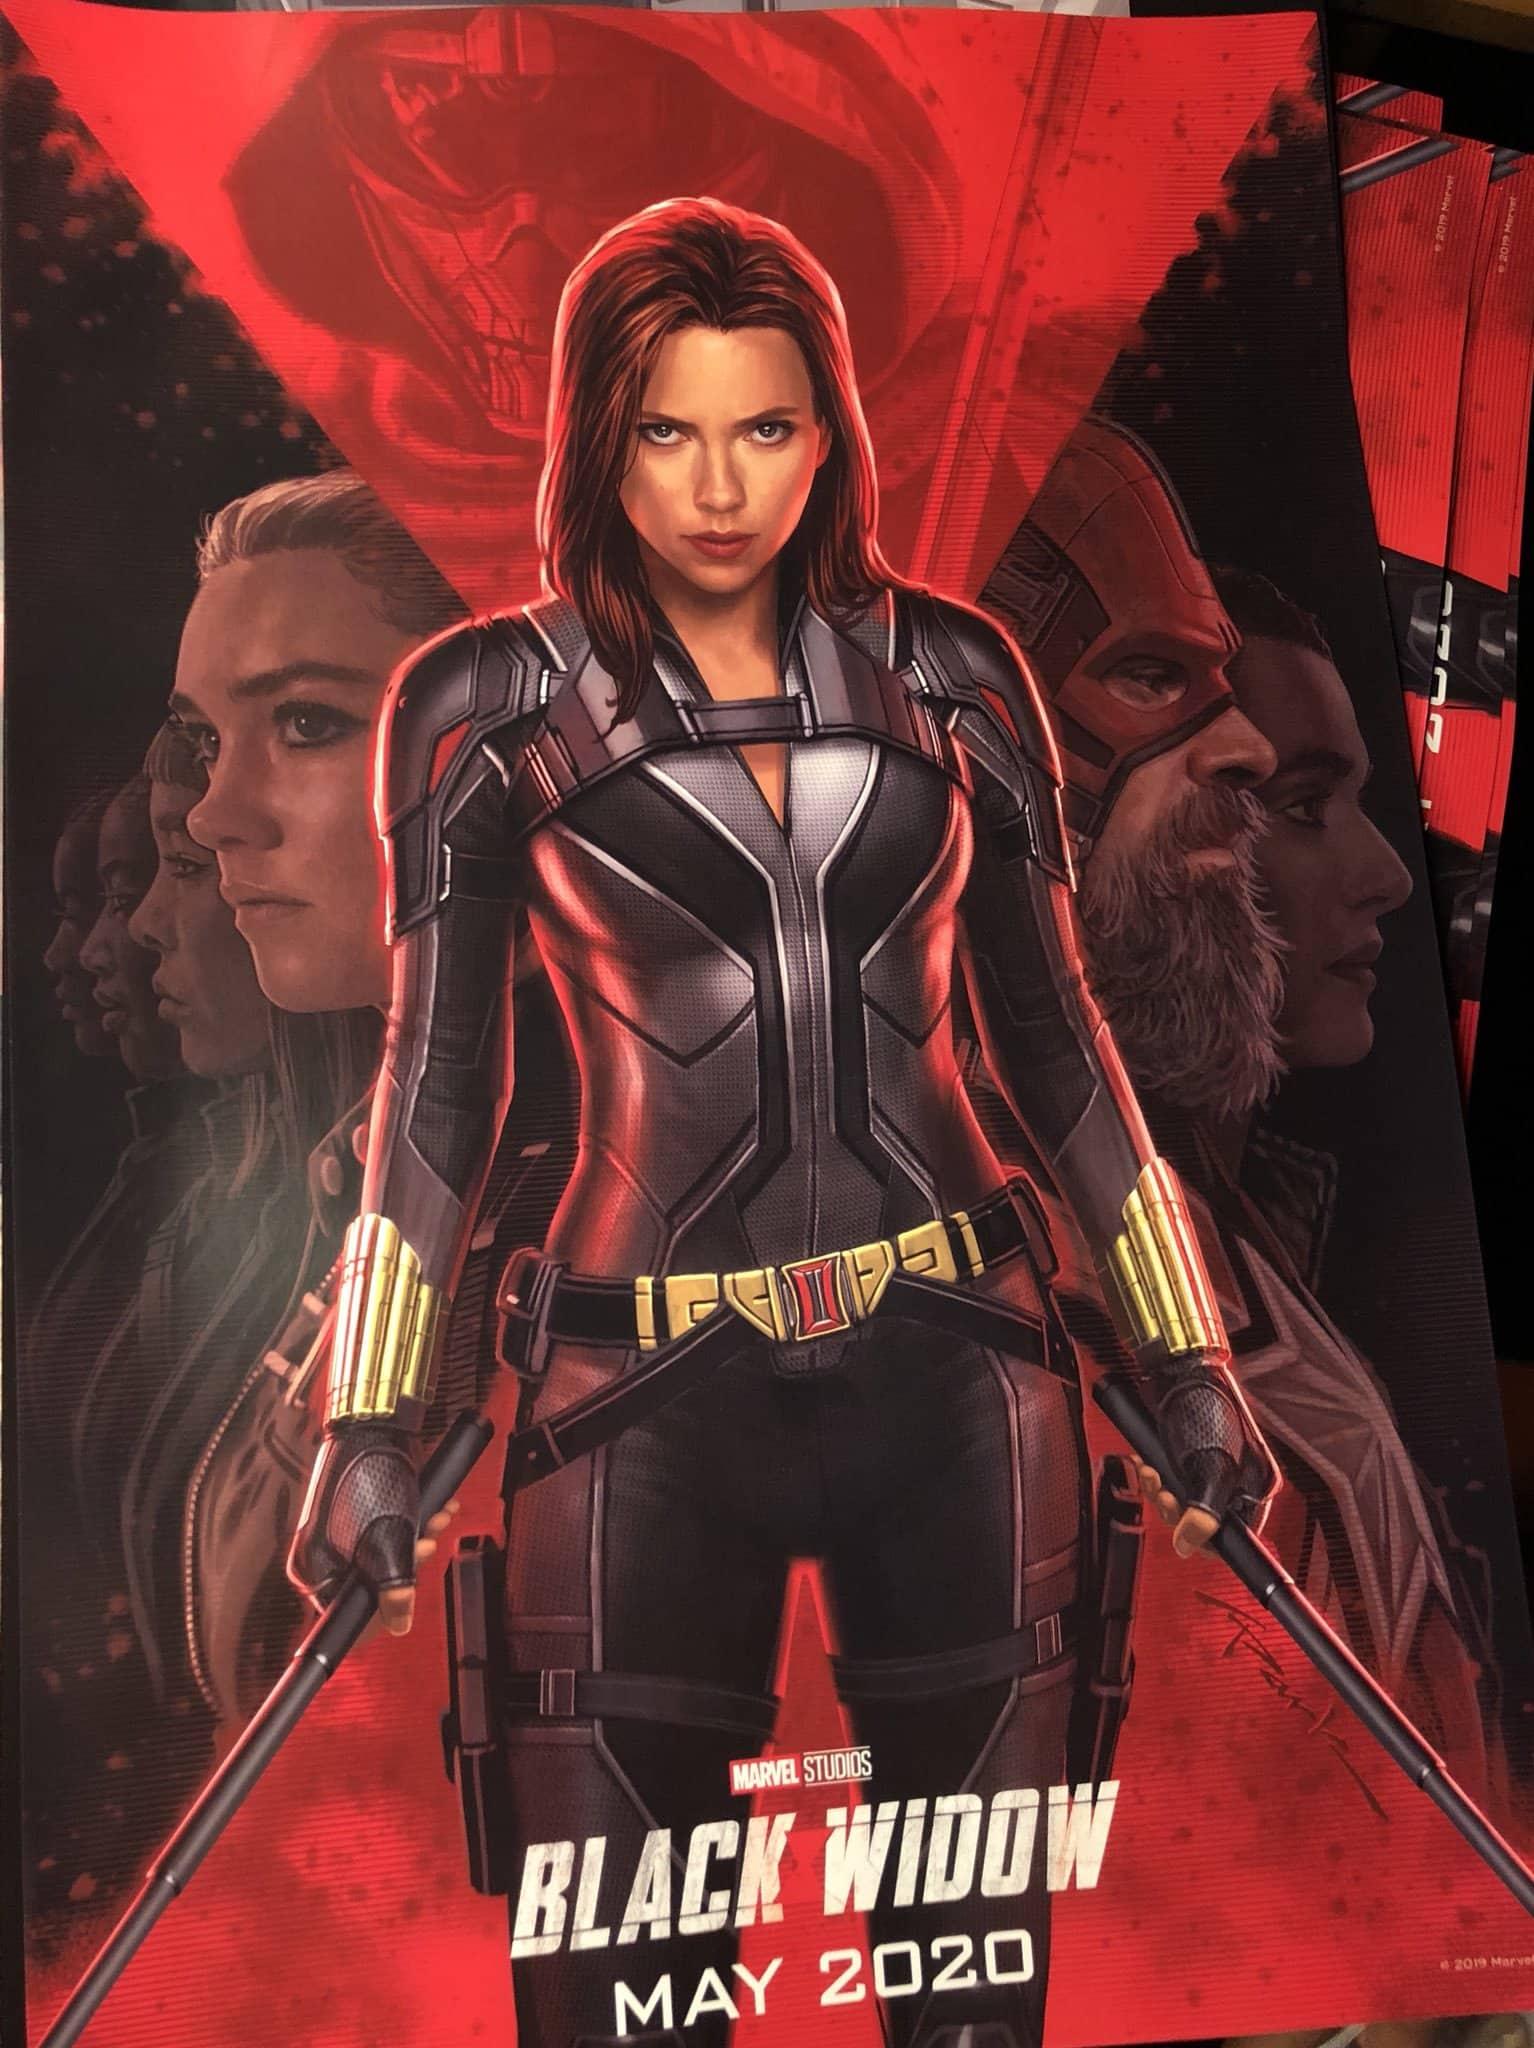 Poster de Marvel Black Widow (Viuda negra) con Scarlett Johansson